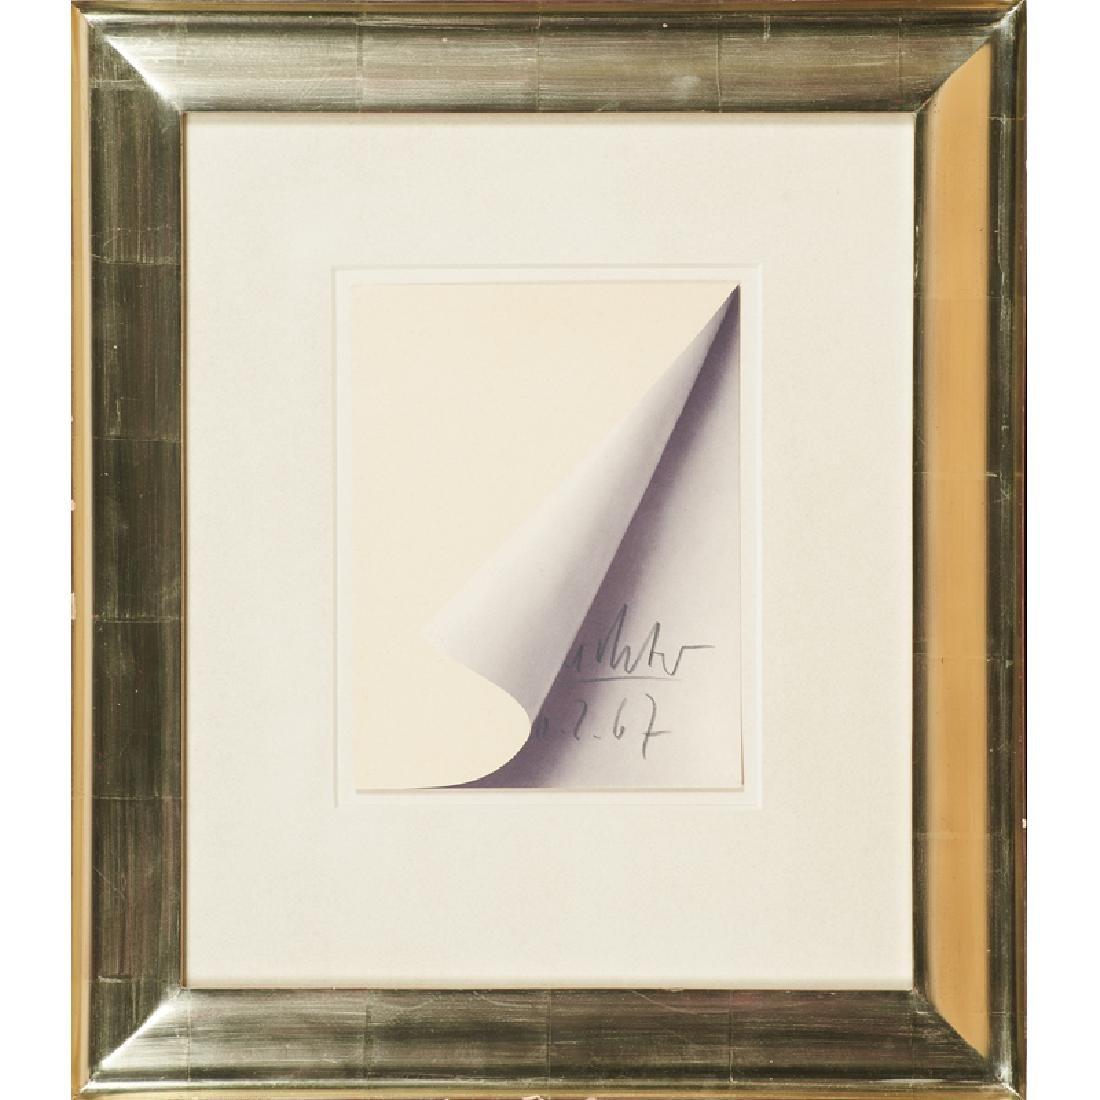 Gerhard Richter (German, b. 1932) - 2